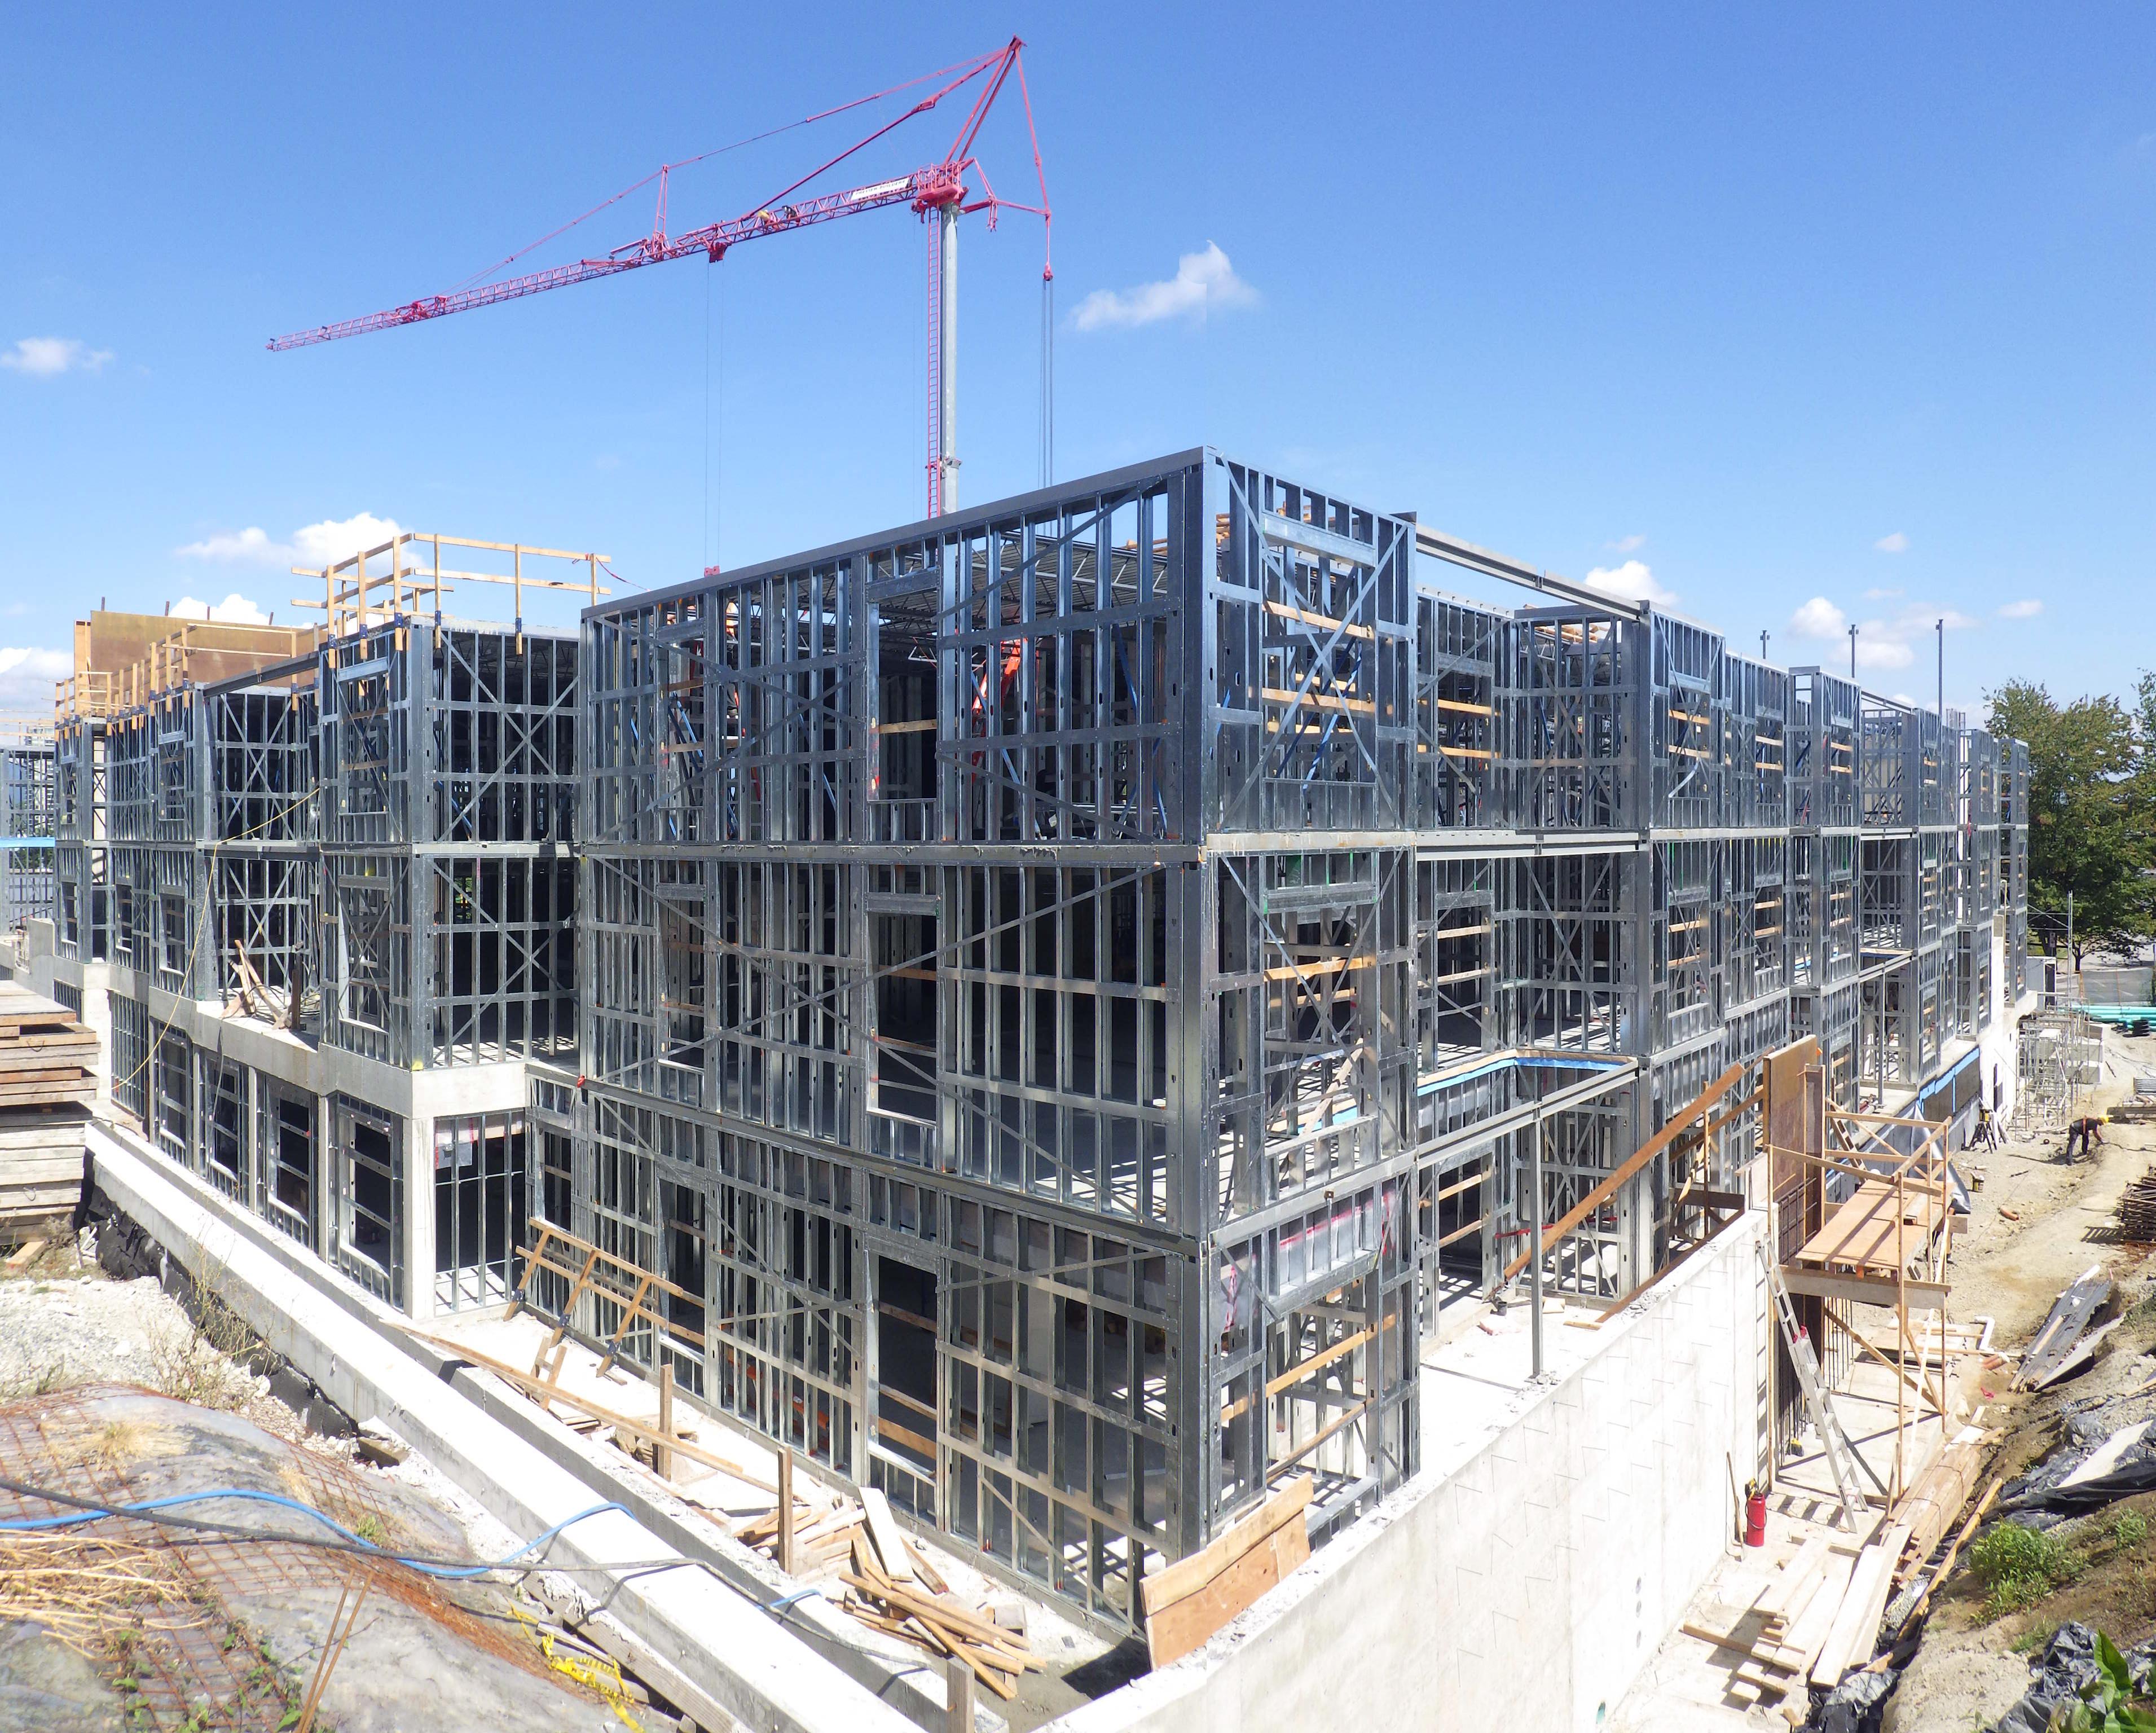 https://highpointeliving.ca/wp-content/uploads/2019/08/duplicate-Steel-construction-12E-copy.jpeg